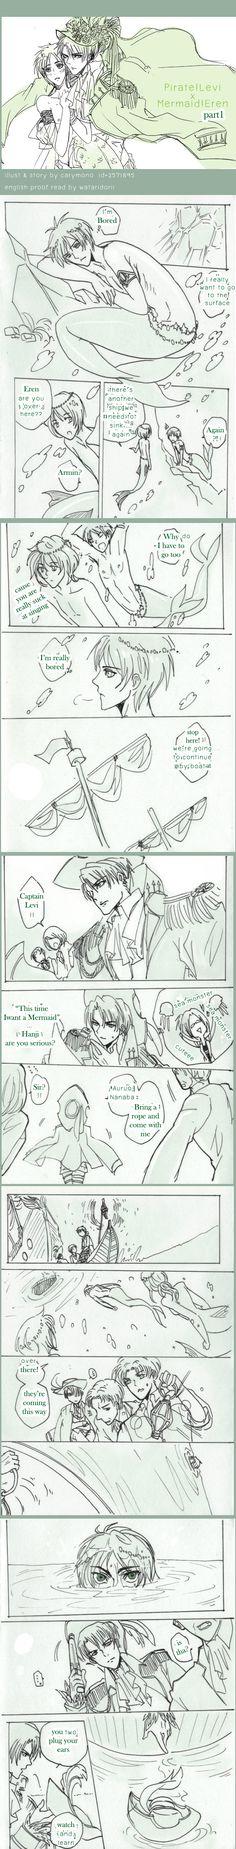 SnK'AU : Pirate!Levi x Mermaid!Eren part1 by illuscarymono.deviantart.com on @deviantART